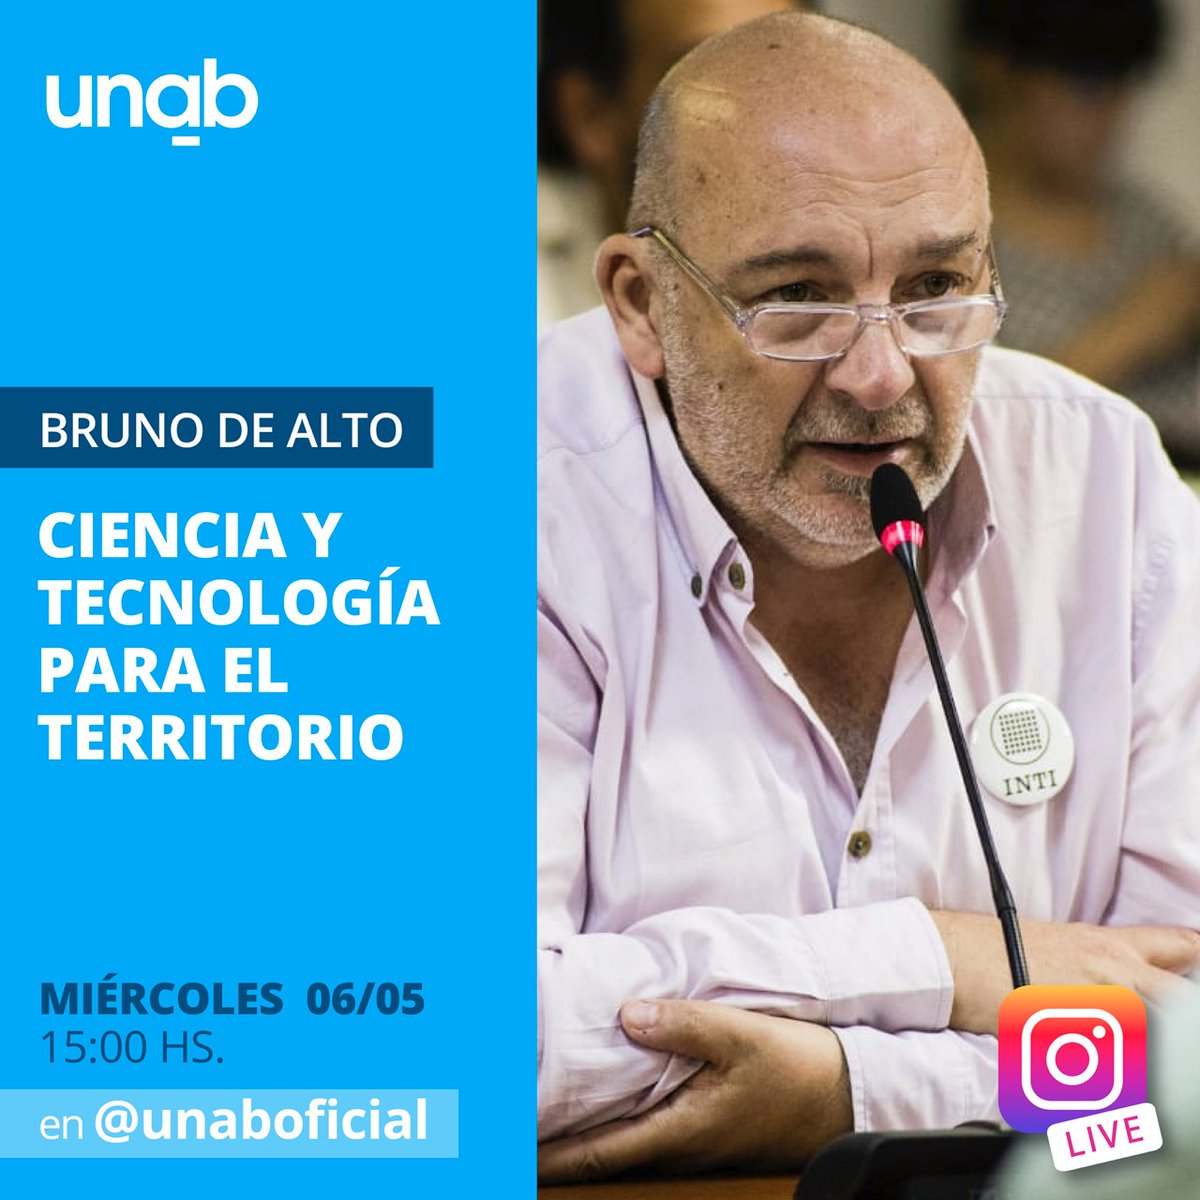 BRUNO PEDRO DE ALTO (@BRUNOPEDRODEALT) | Twitter